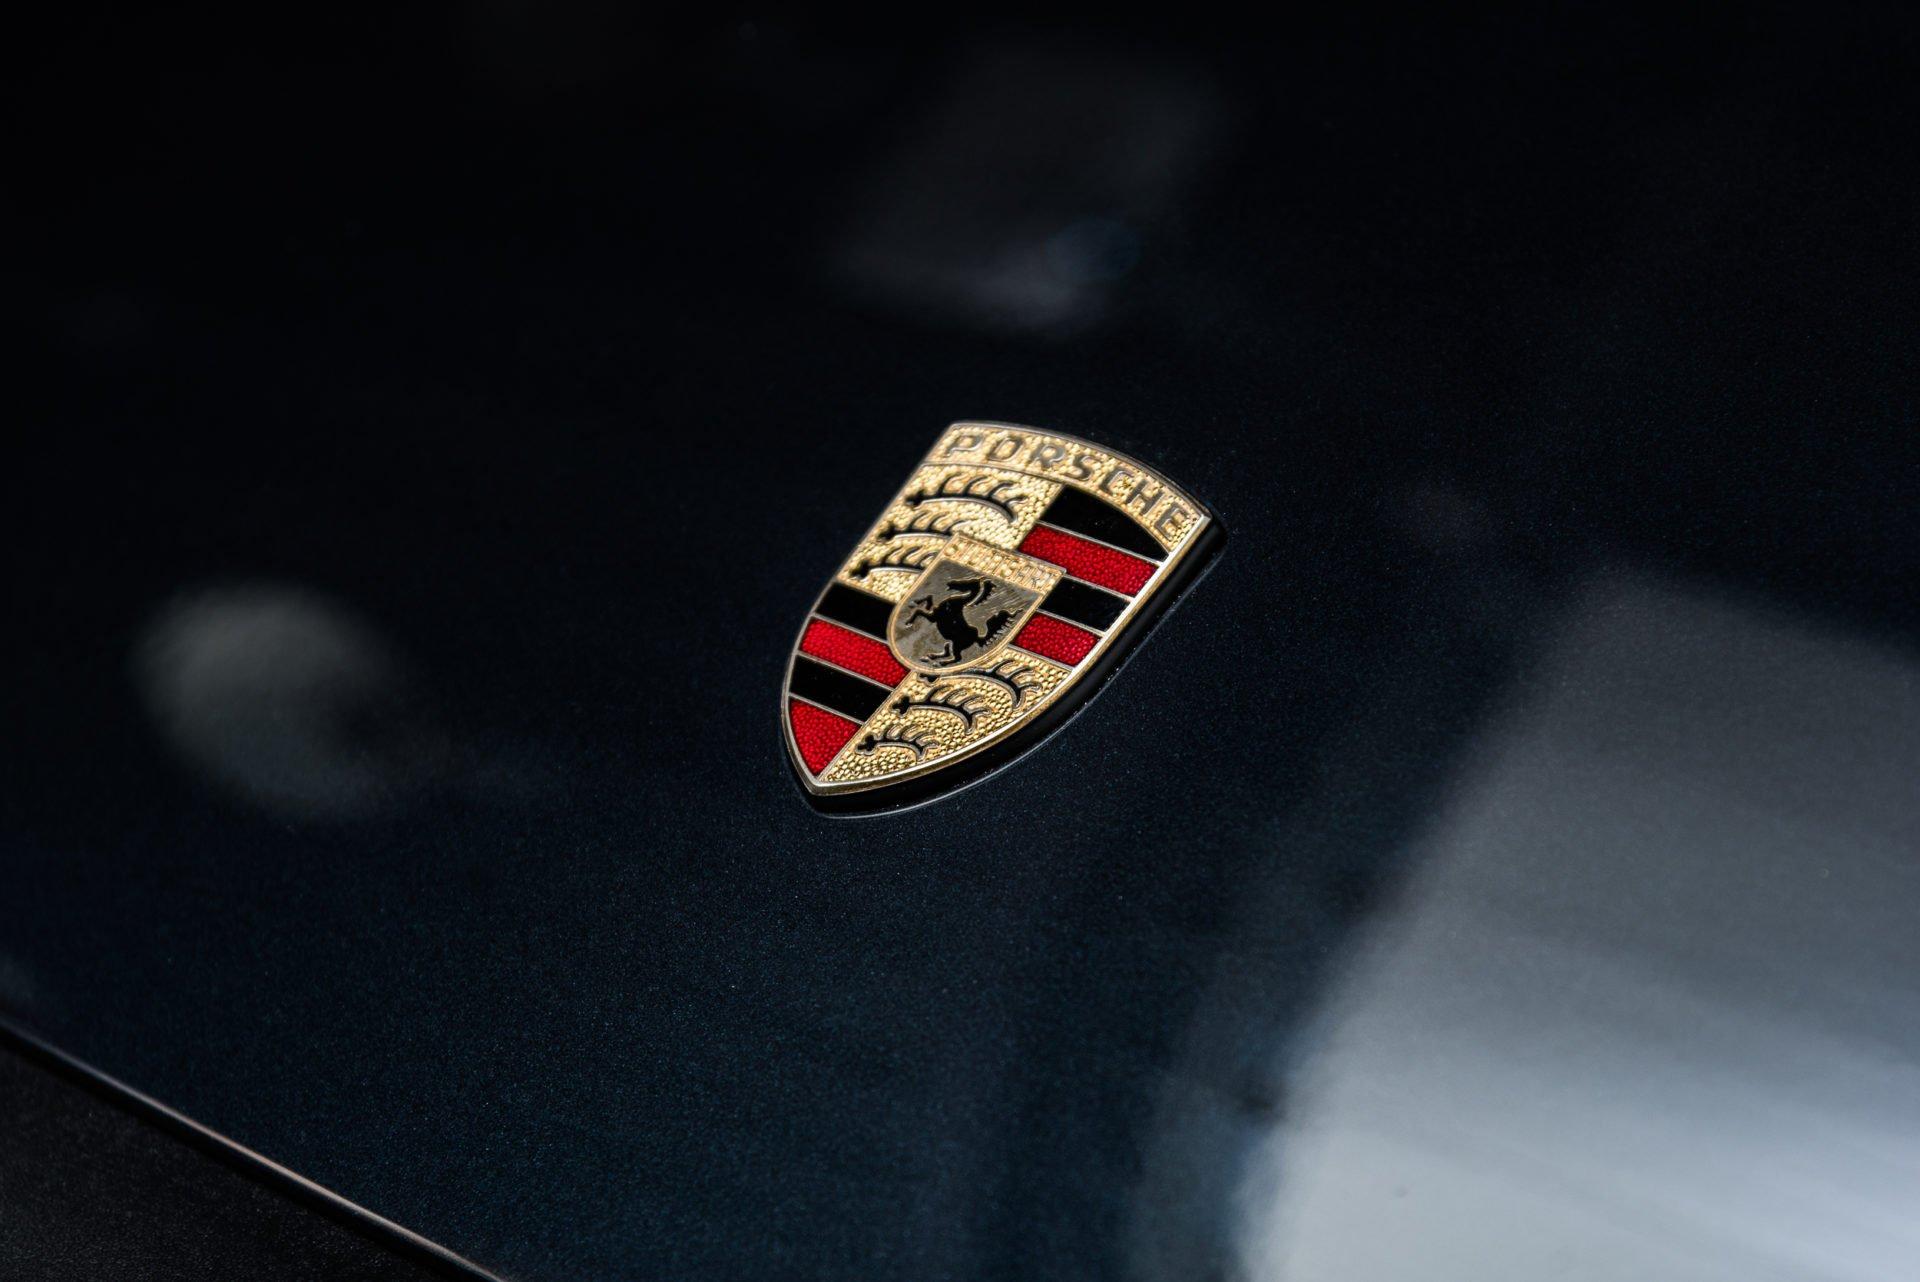 Porsche 930 Turbo - 3